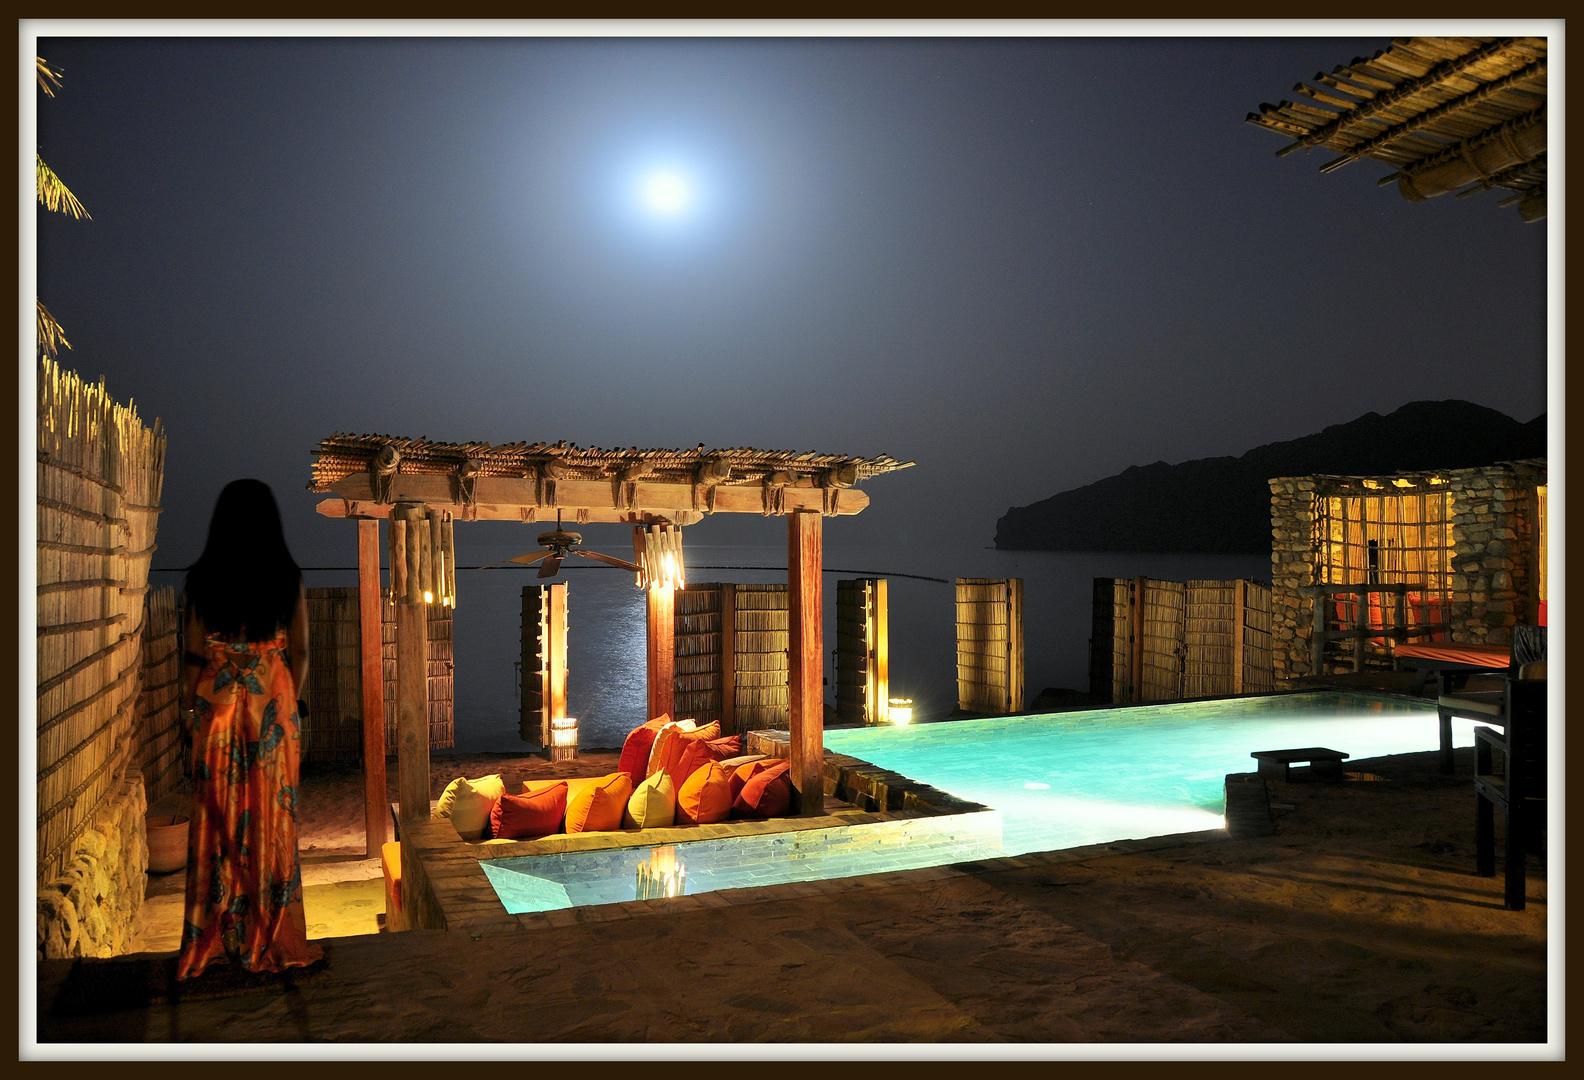 Six Senses night at Zighy Bay Oman